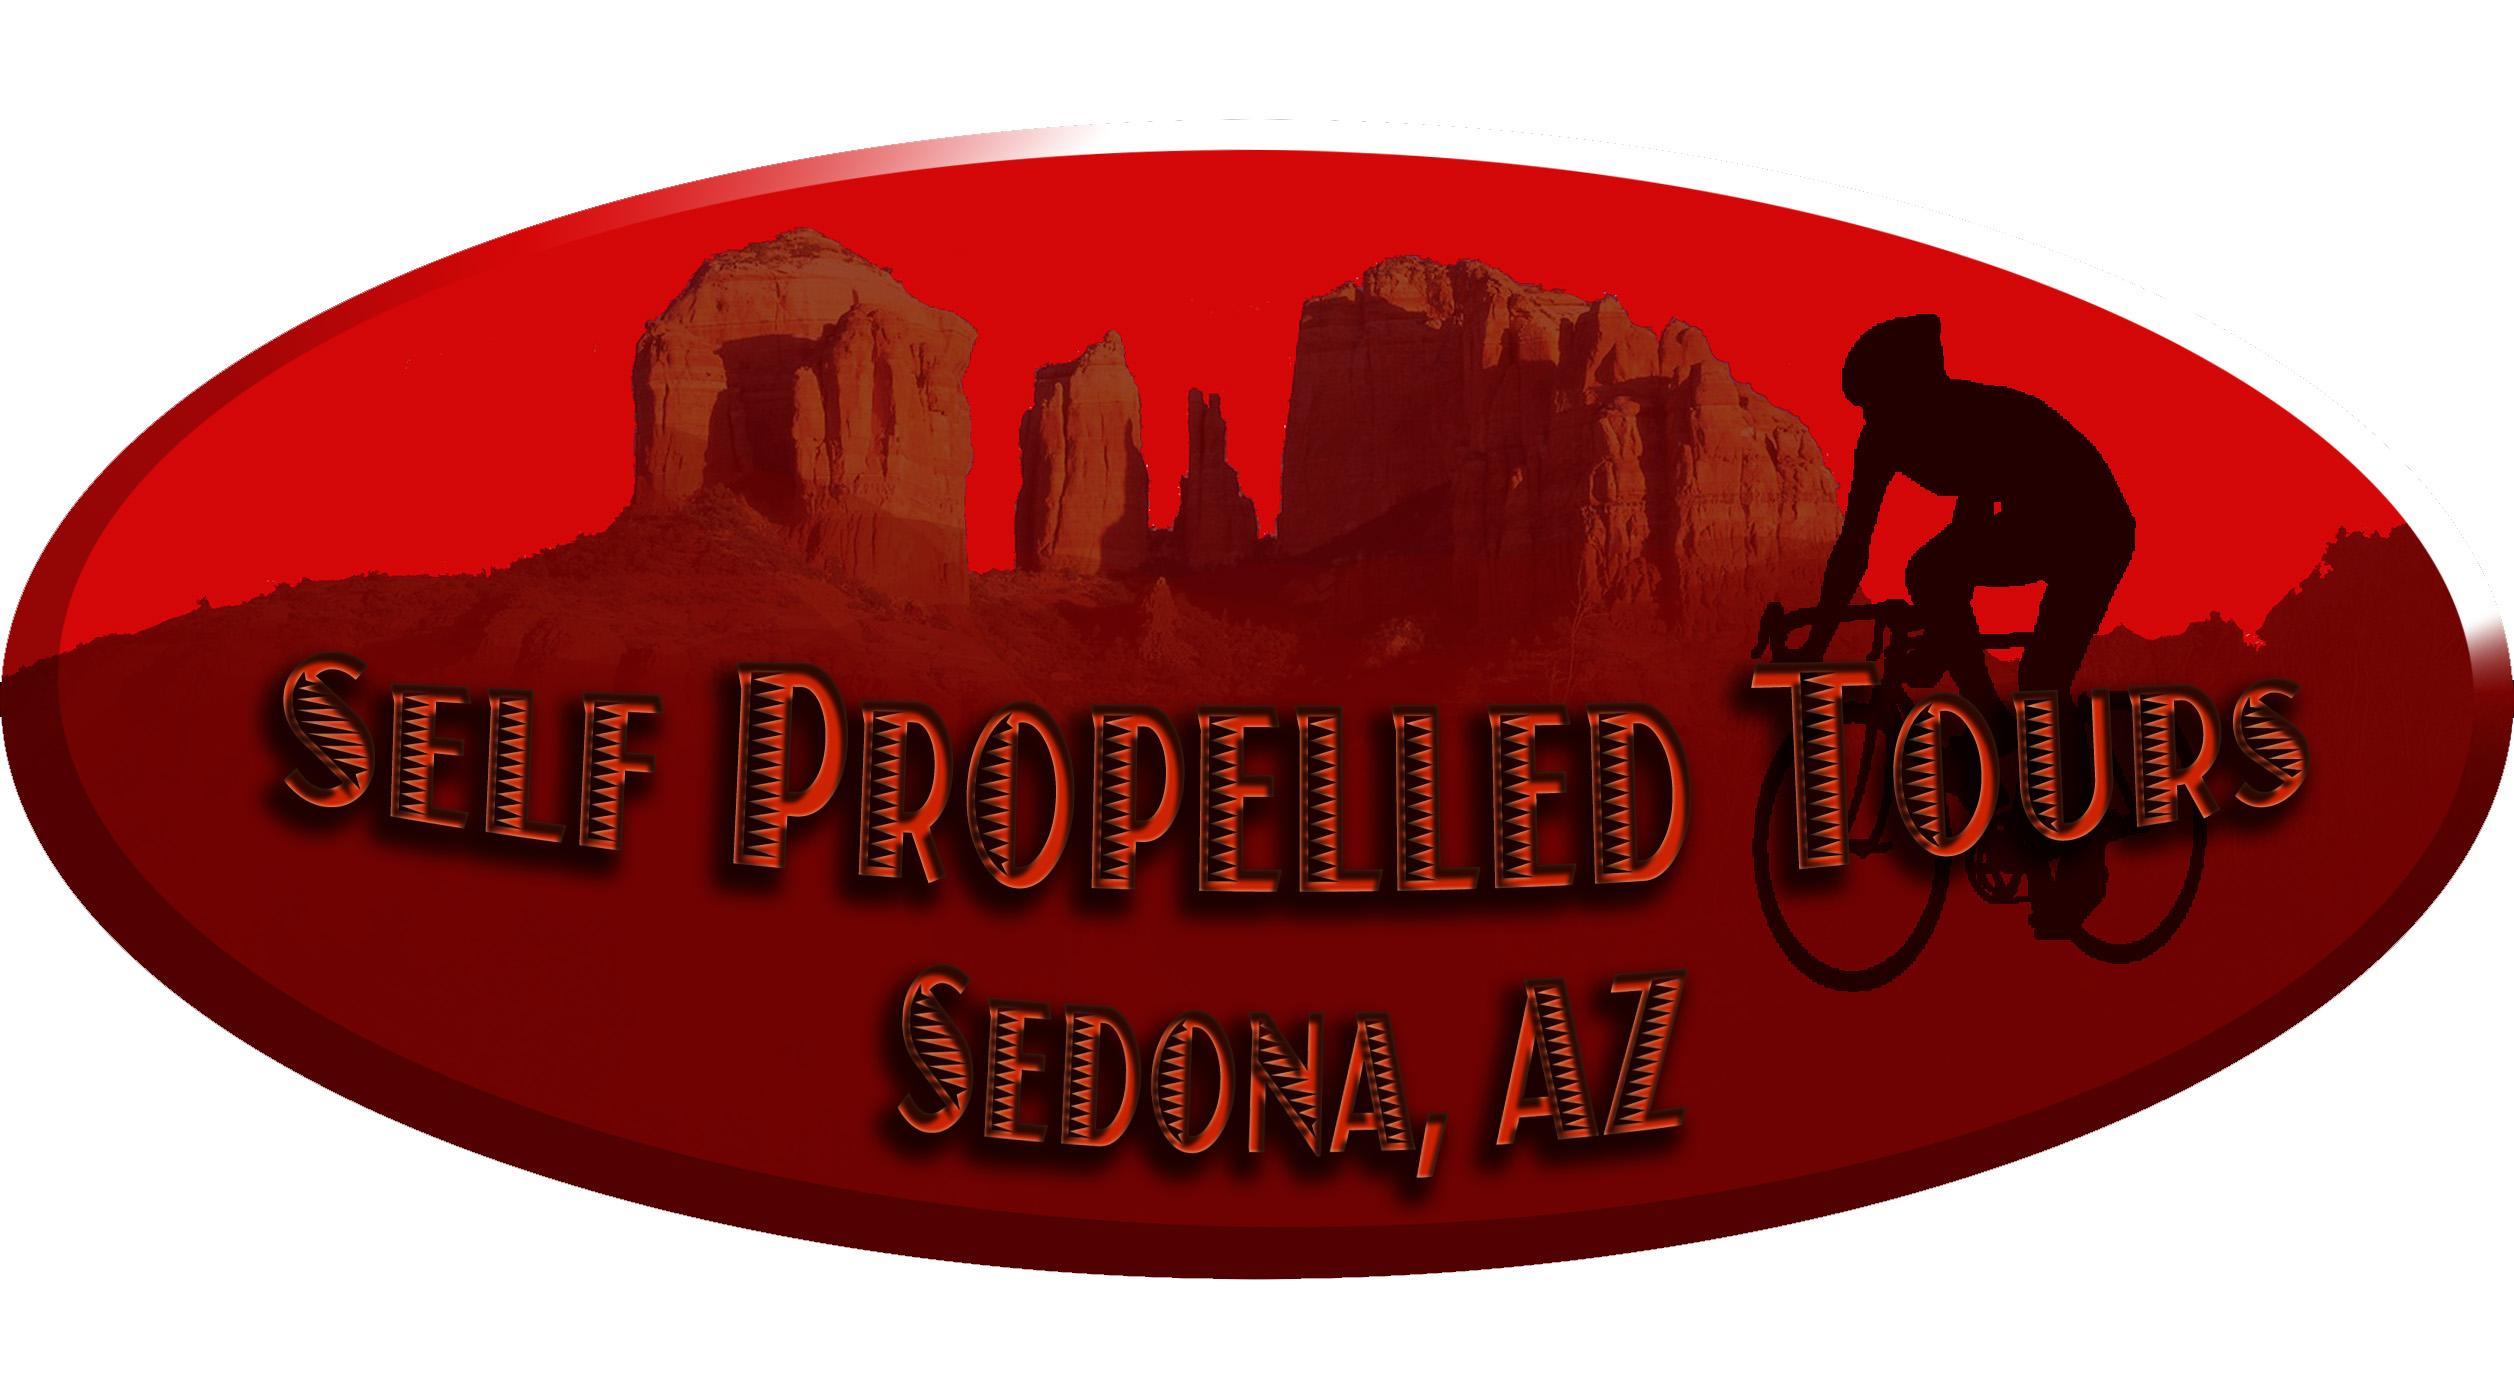 www.selfpropelledtours.com